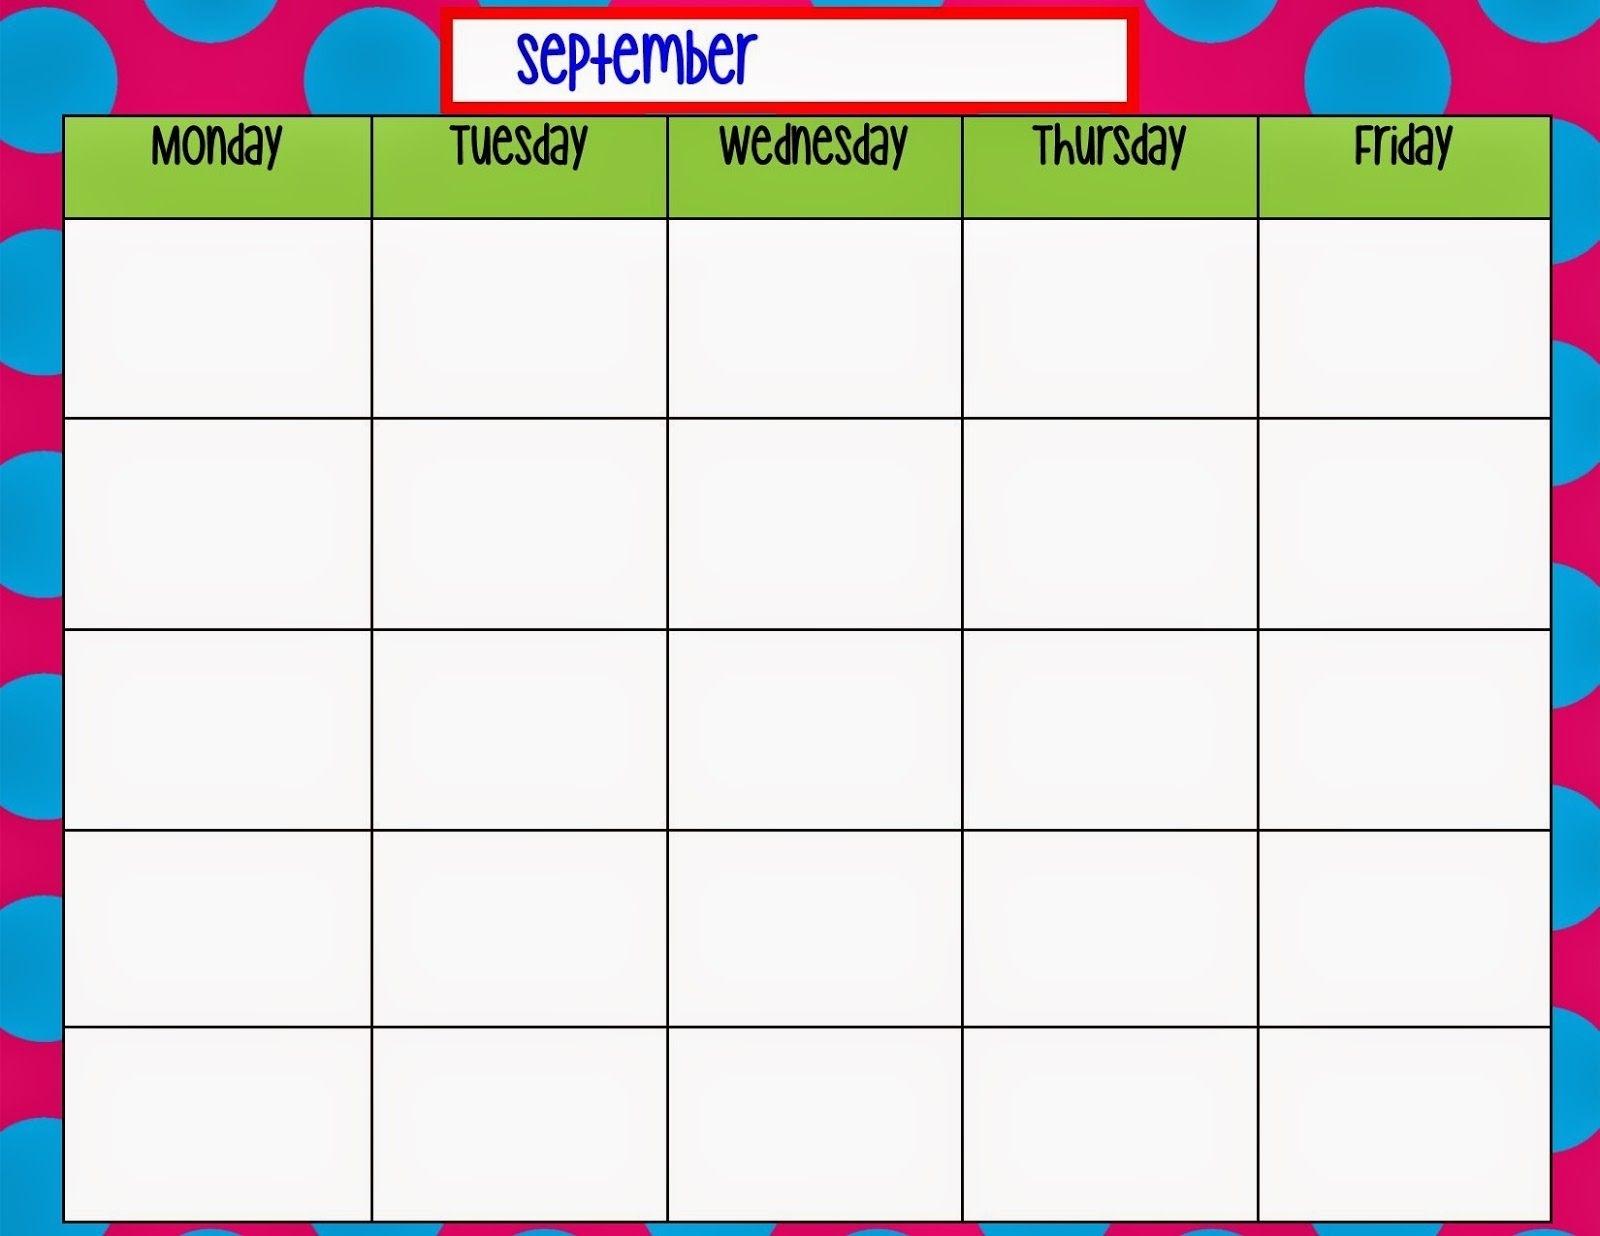 Free Printable Calendar Monday To Sunday | Ten Free Printable Calendar 2020-2021